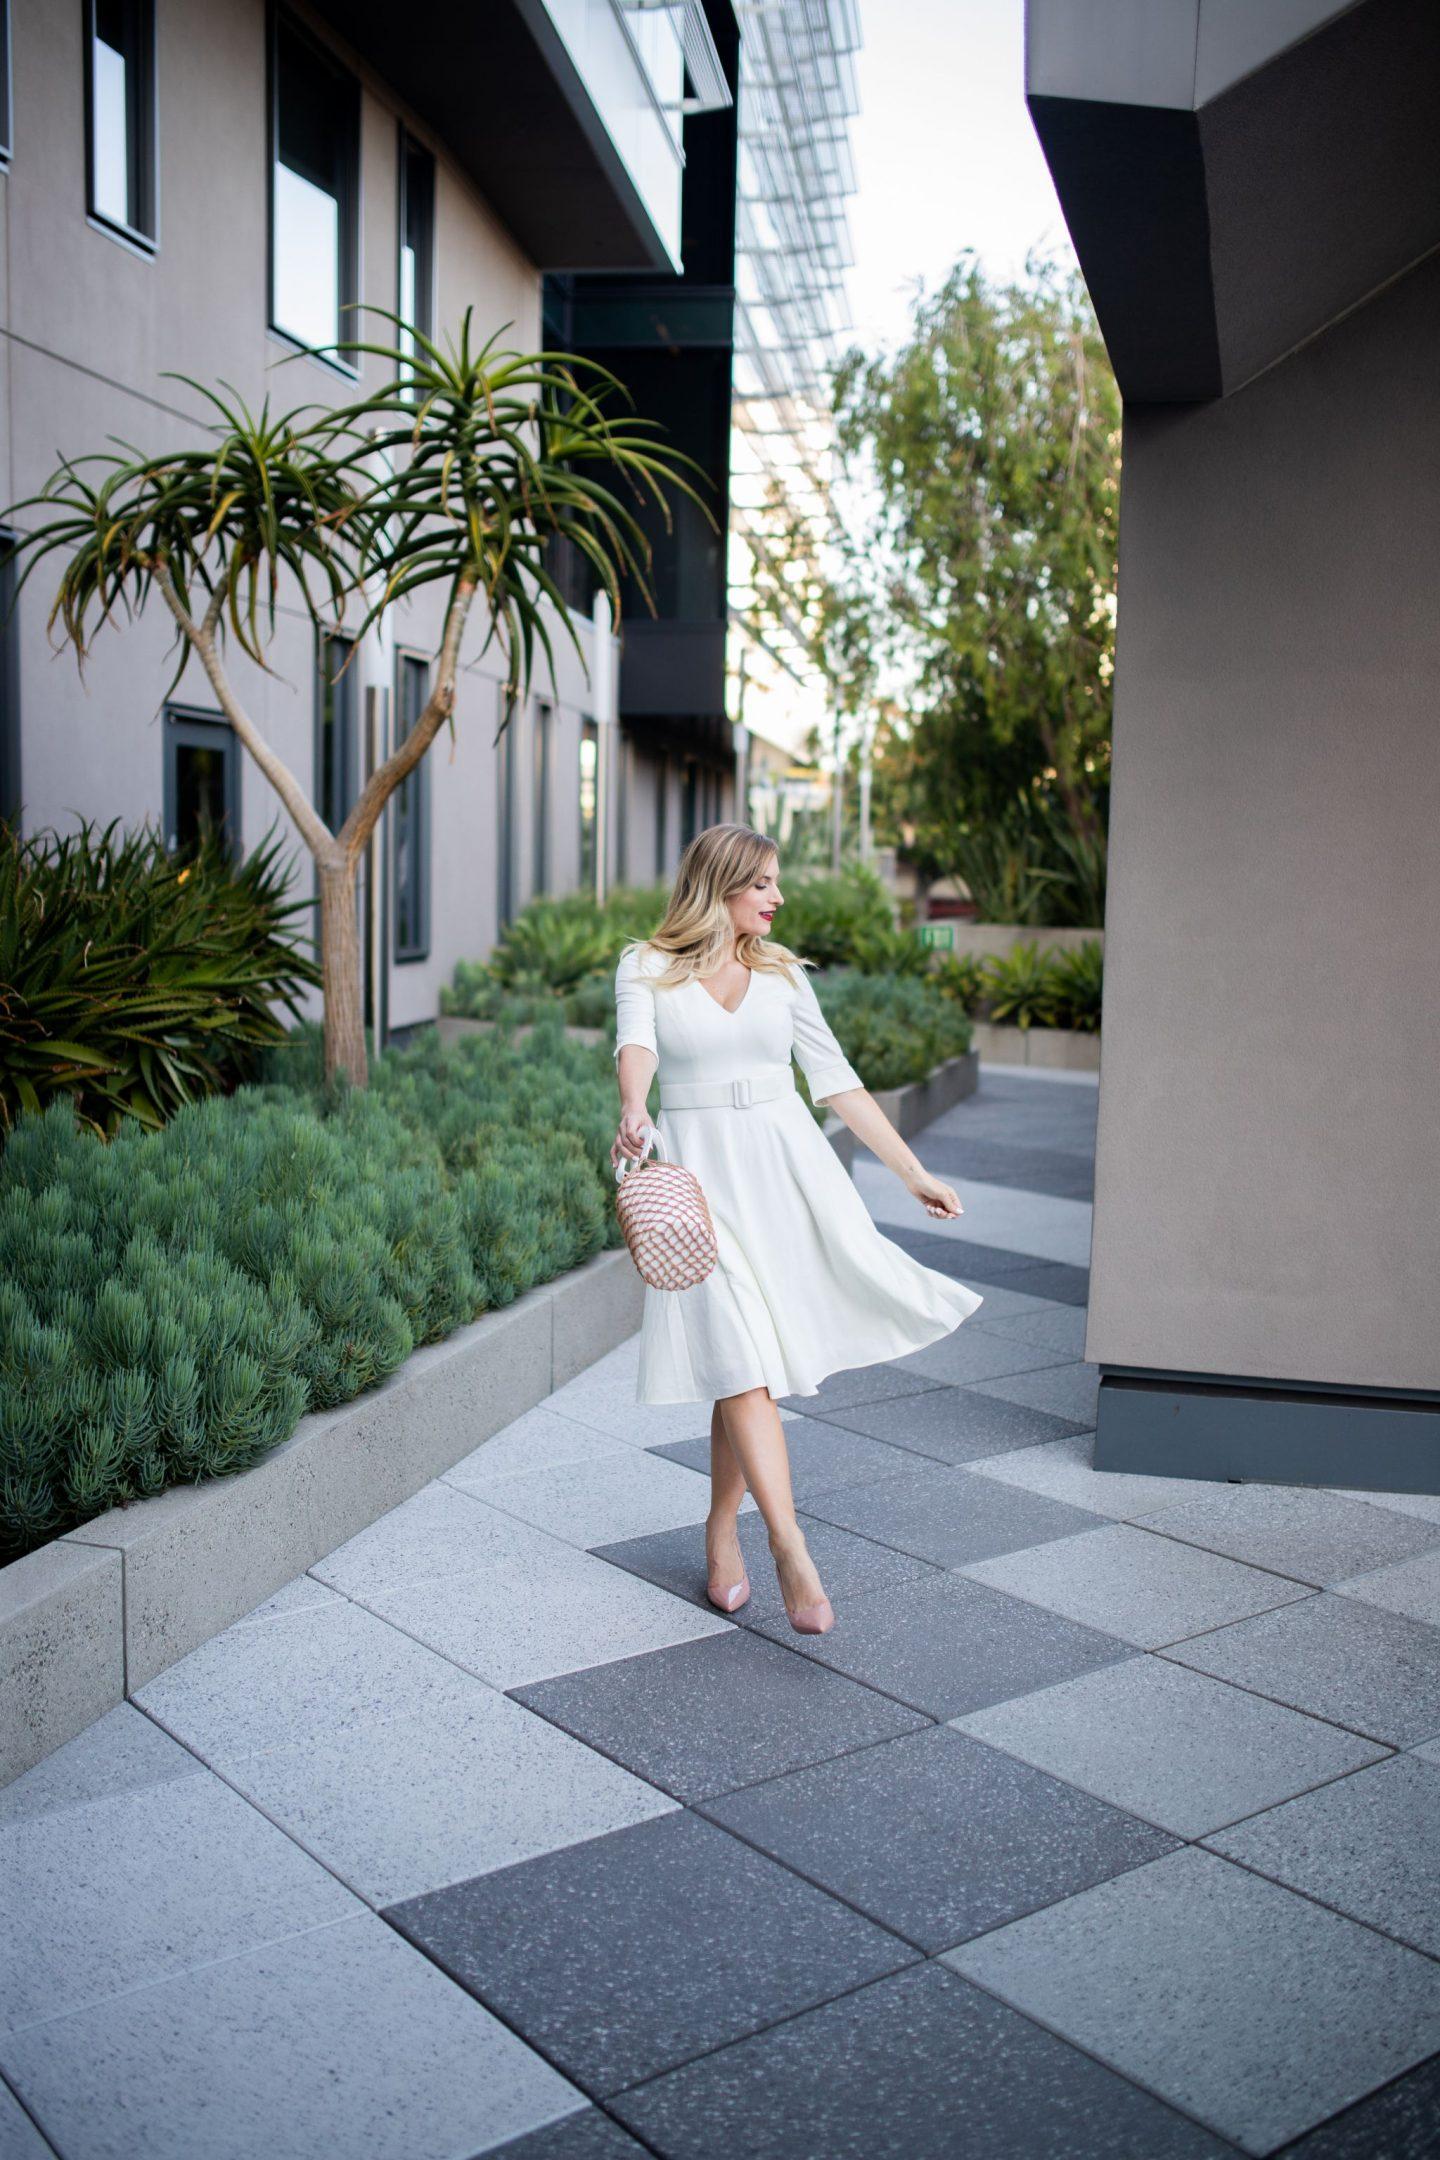 legal-lee-blonde-wearing-harper-rose-dress